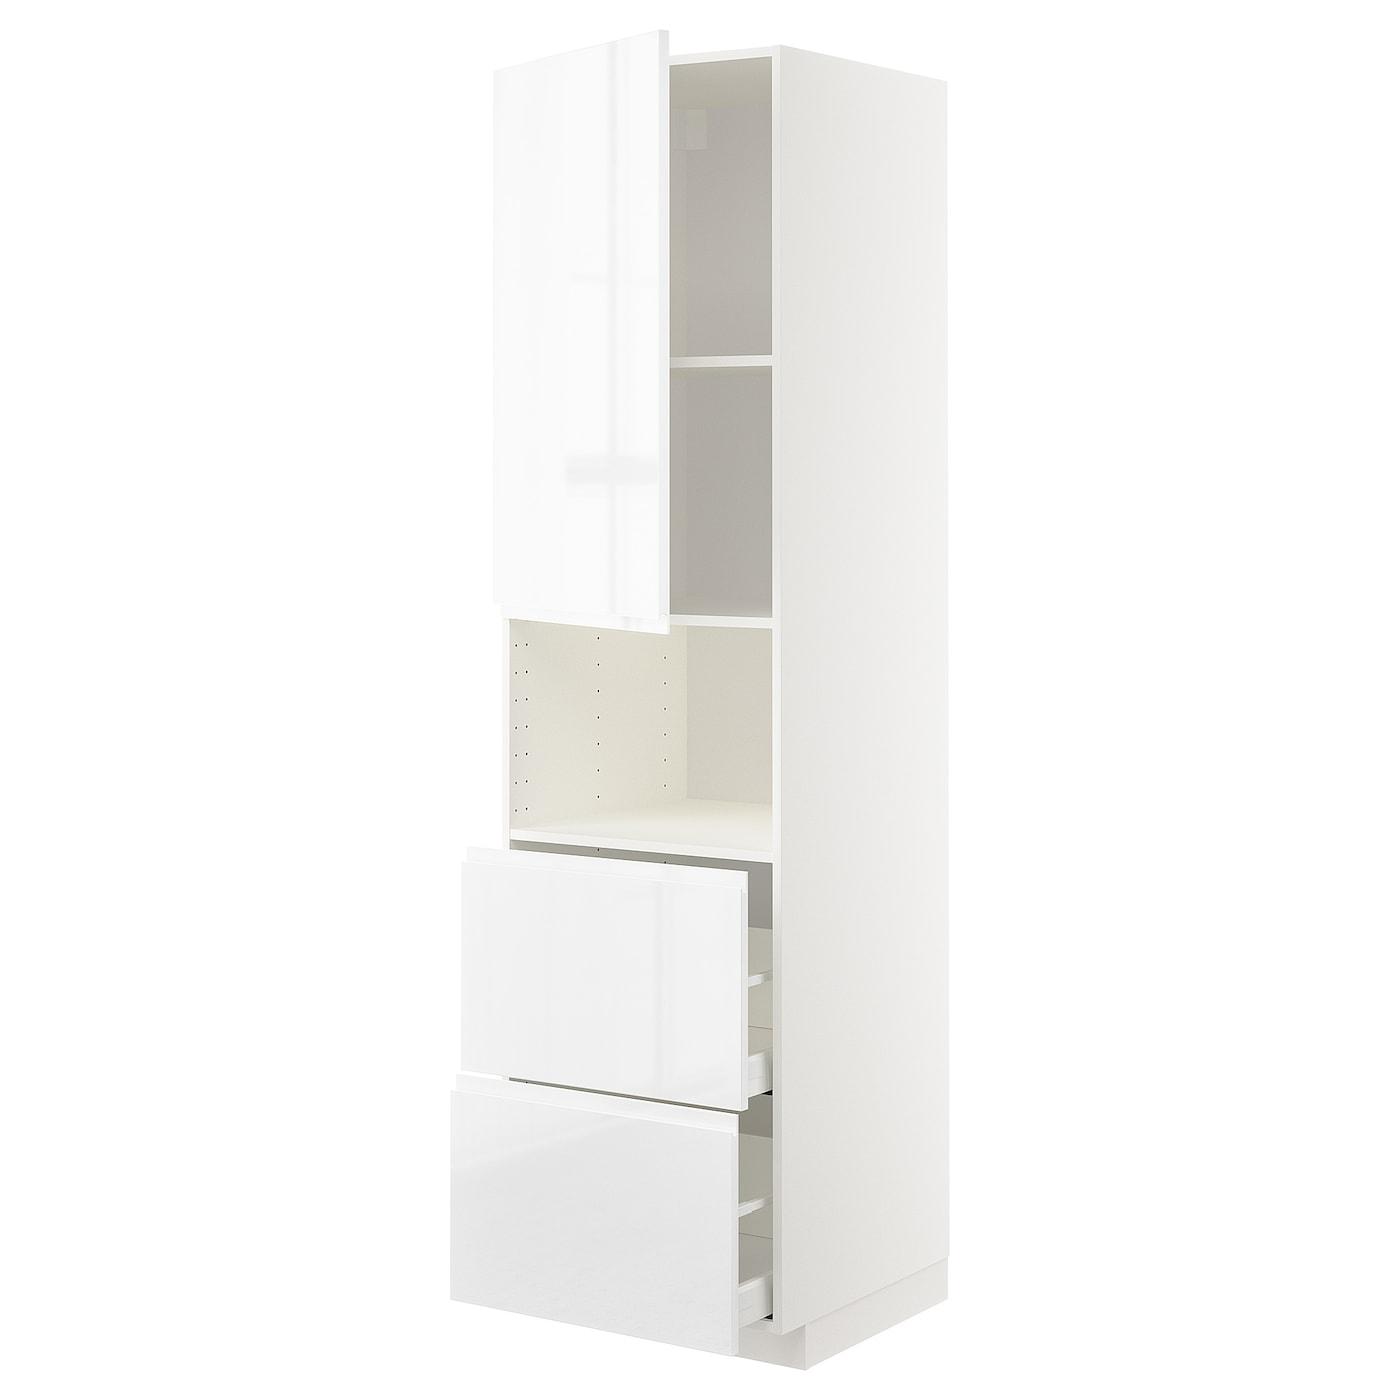 Metod armoire micro ondes av porte 2 tir blanc voxtorp for Porte cuisine blanc brillant